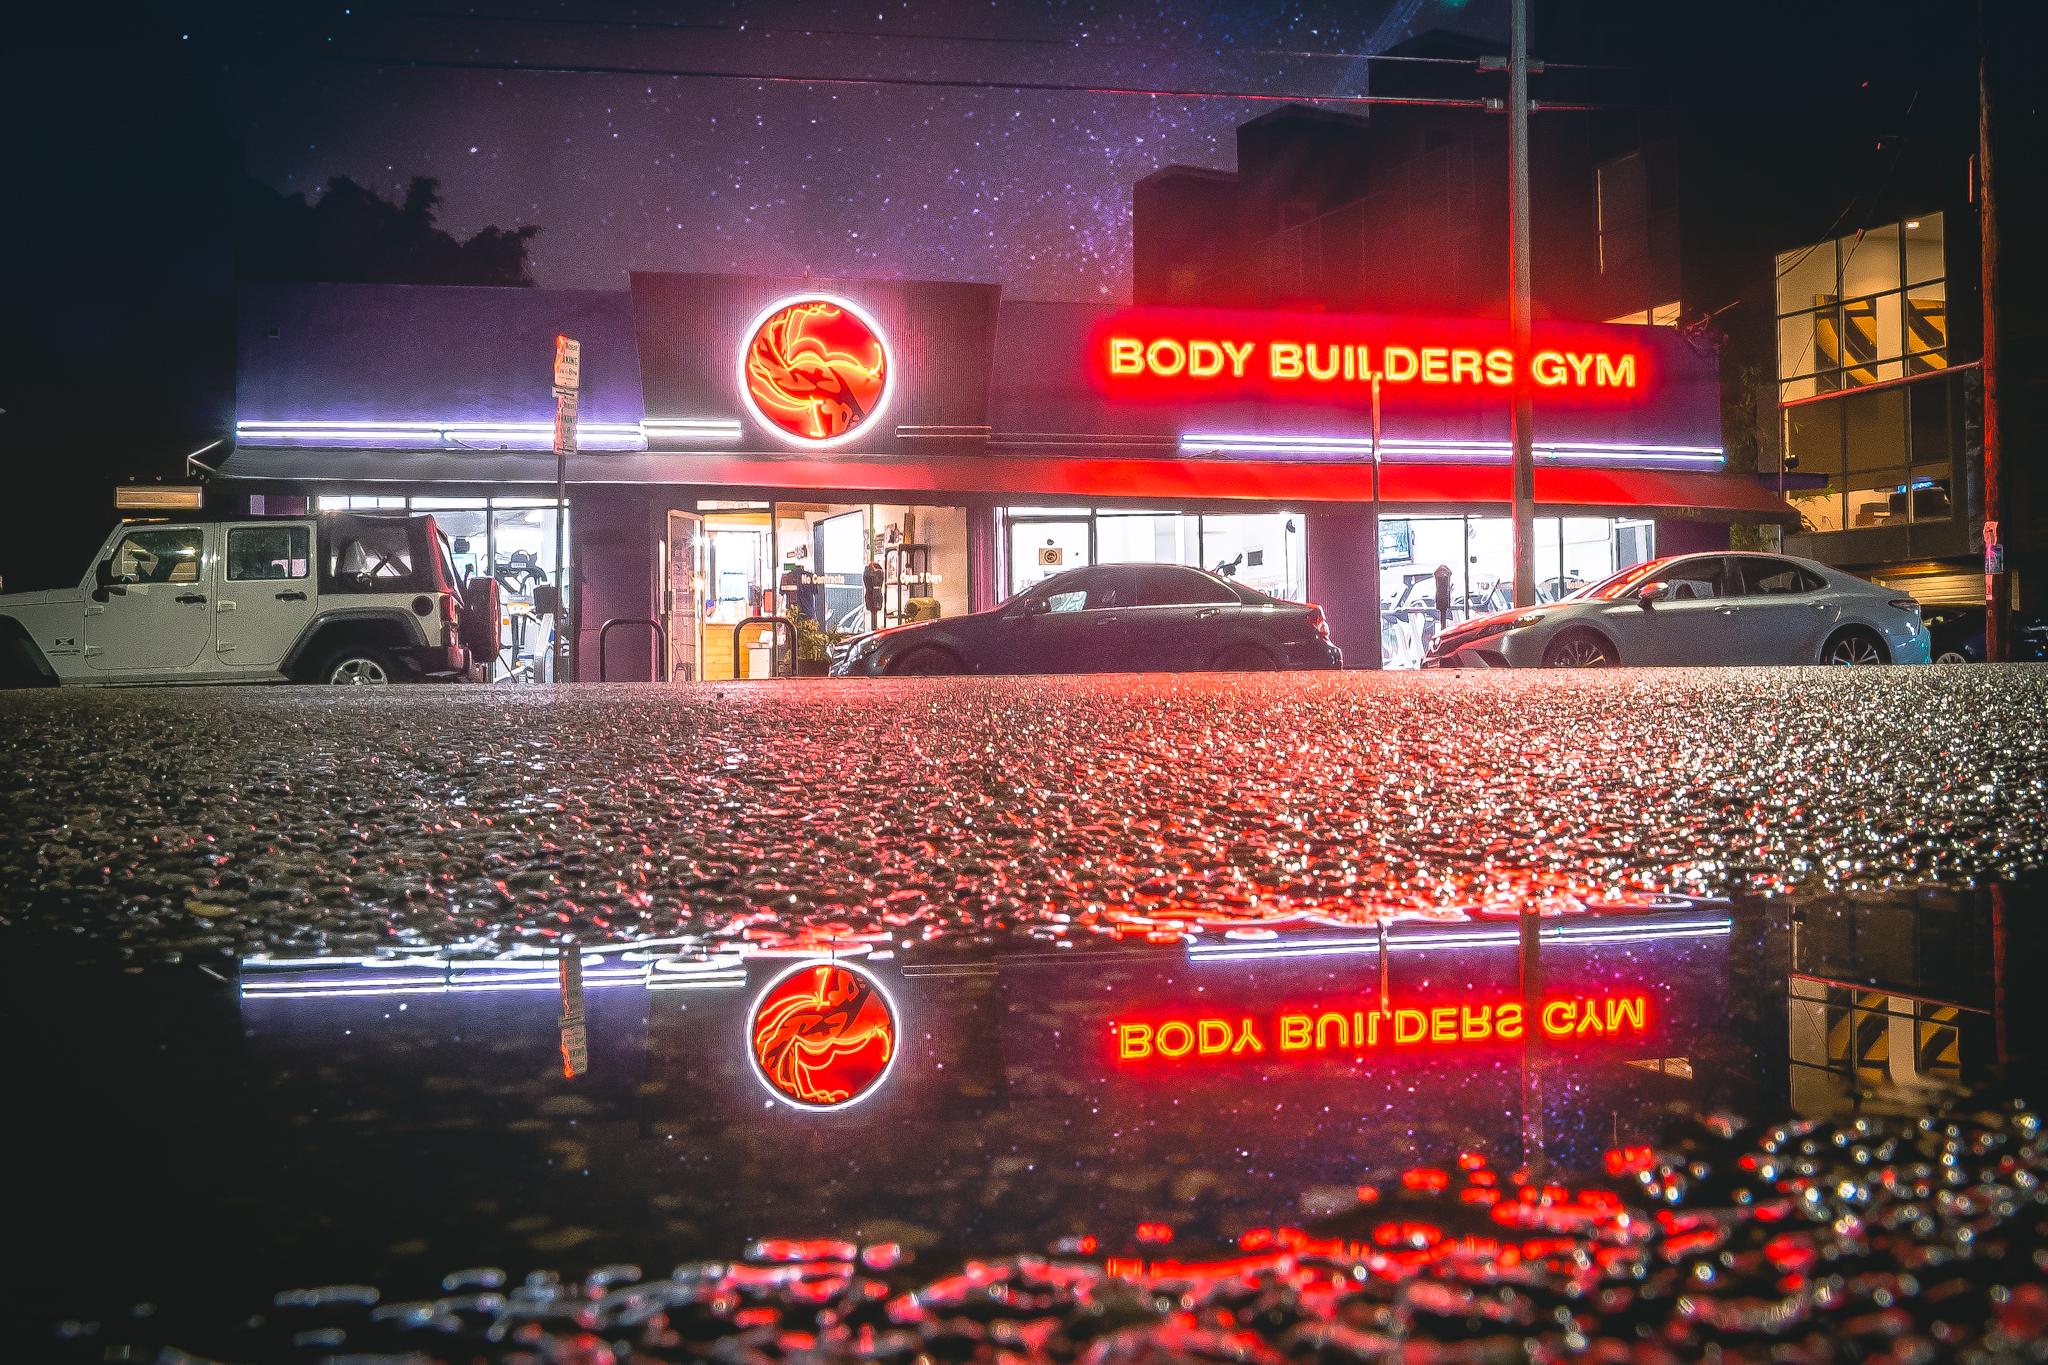 Body Builders Gym - LQ (1 of 1).jpg